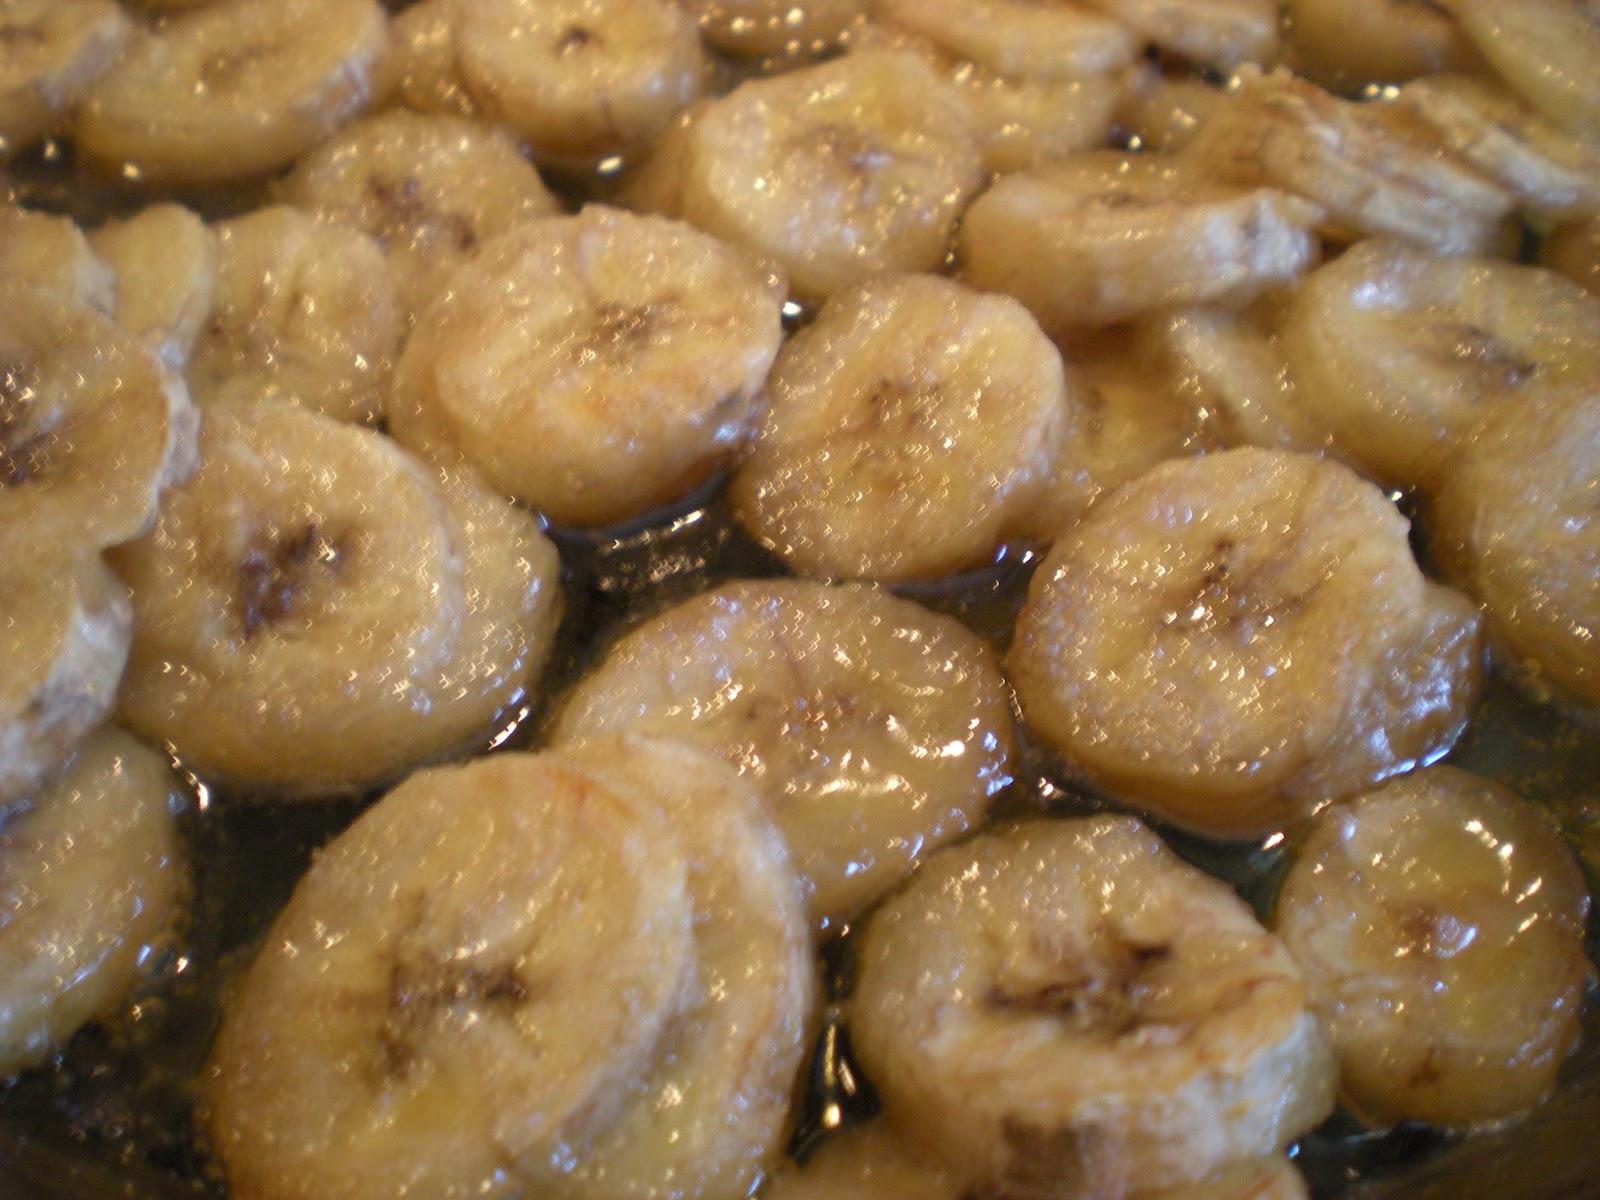 Lemonade Soul: Roasted Banana Cinnamon Rolls